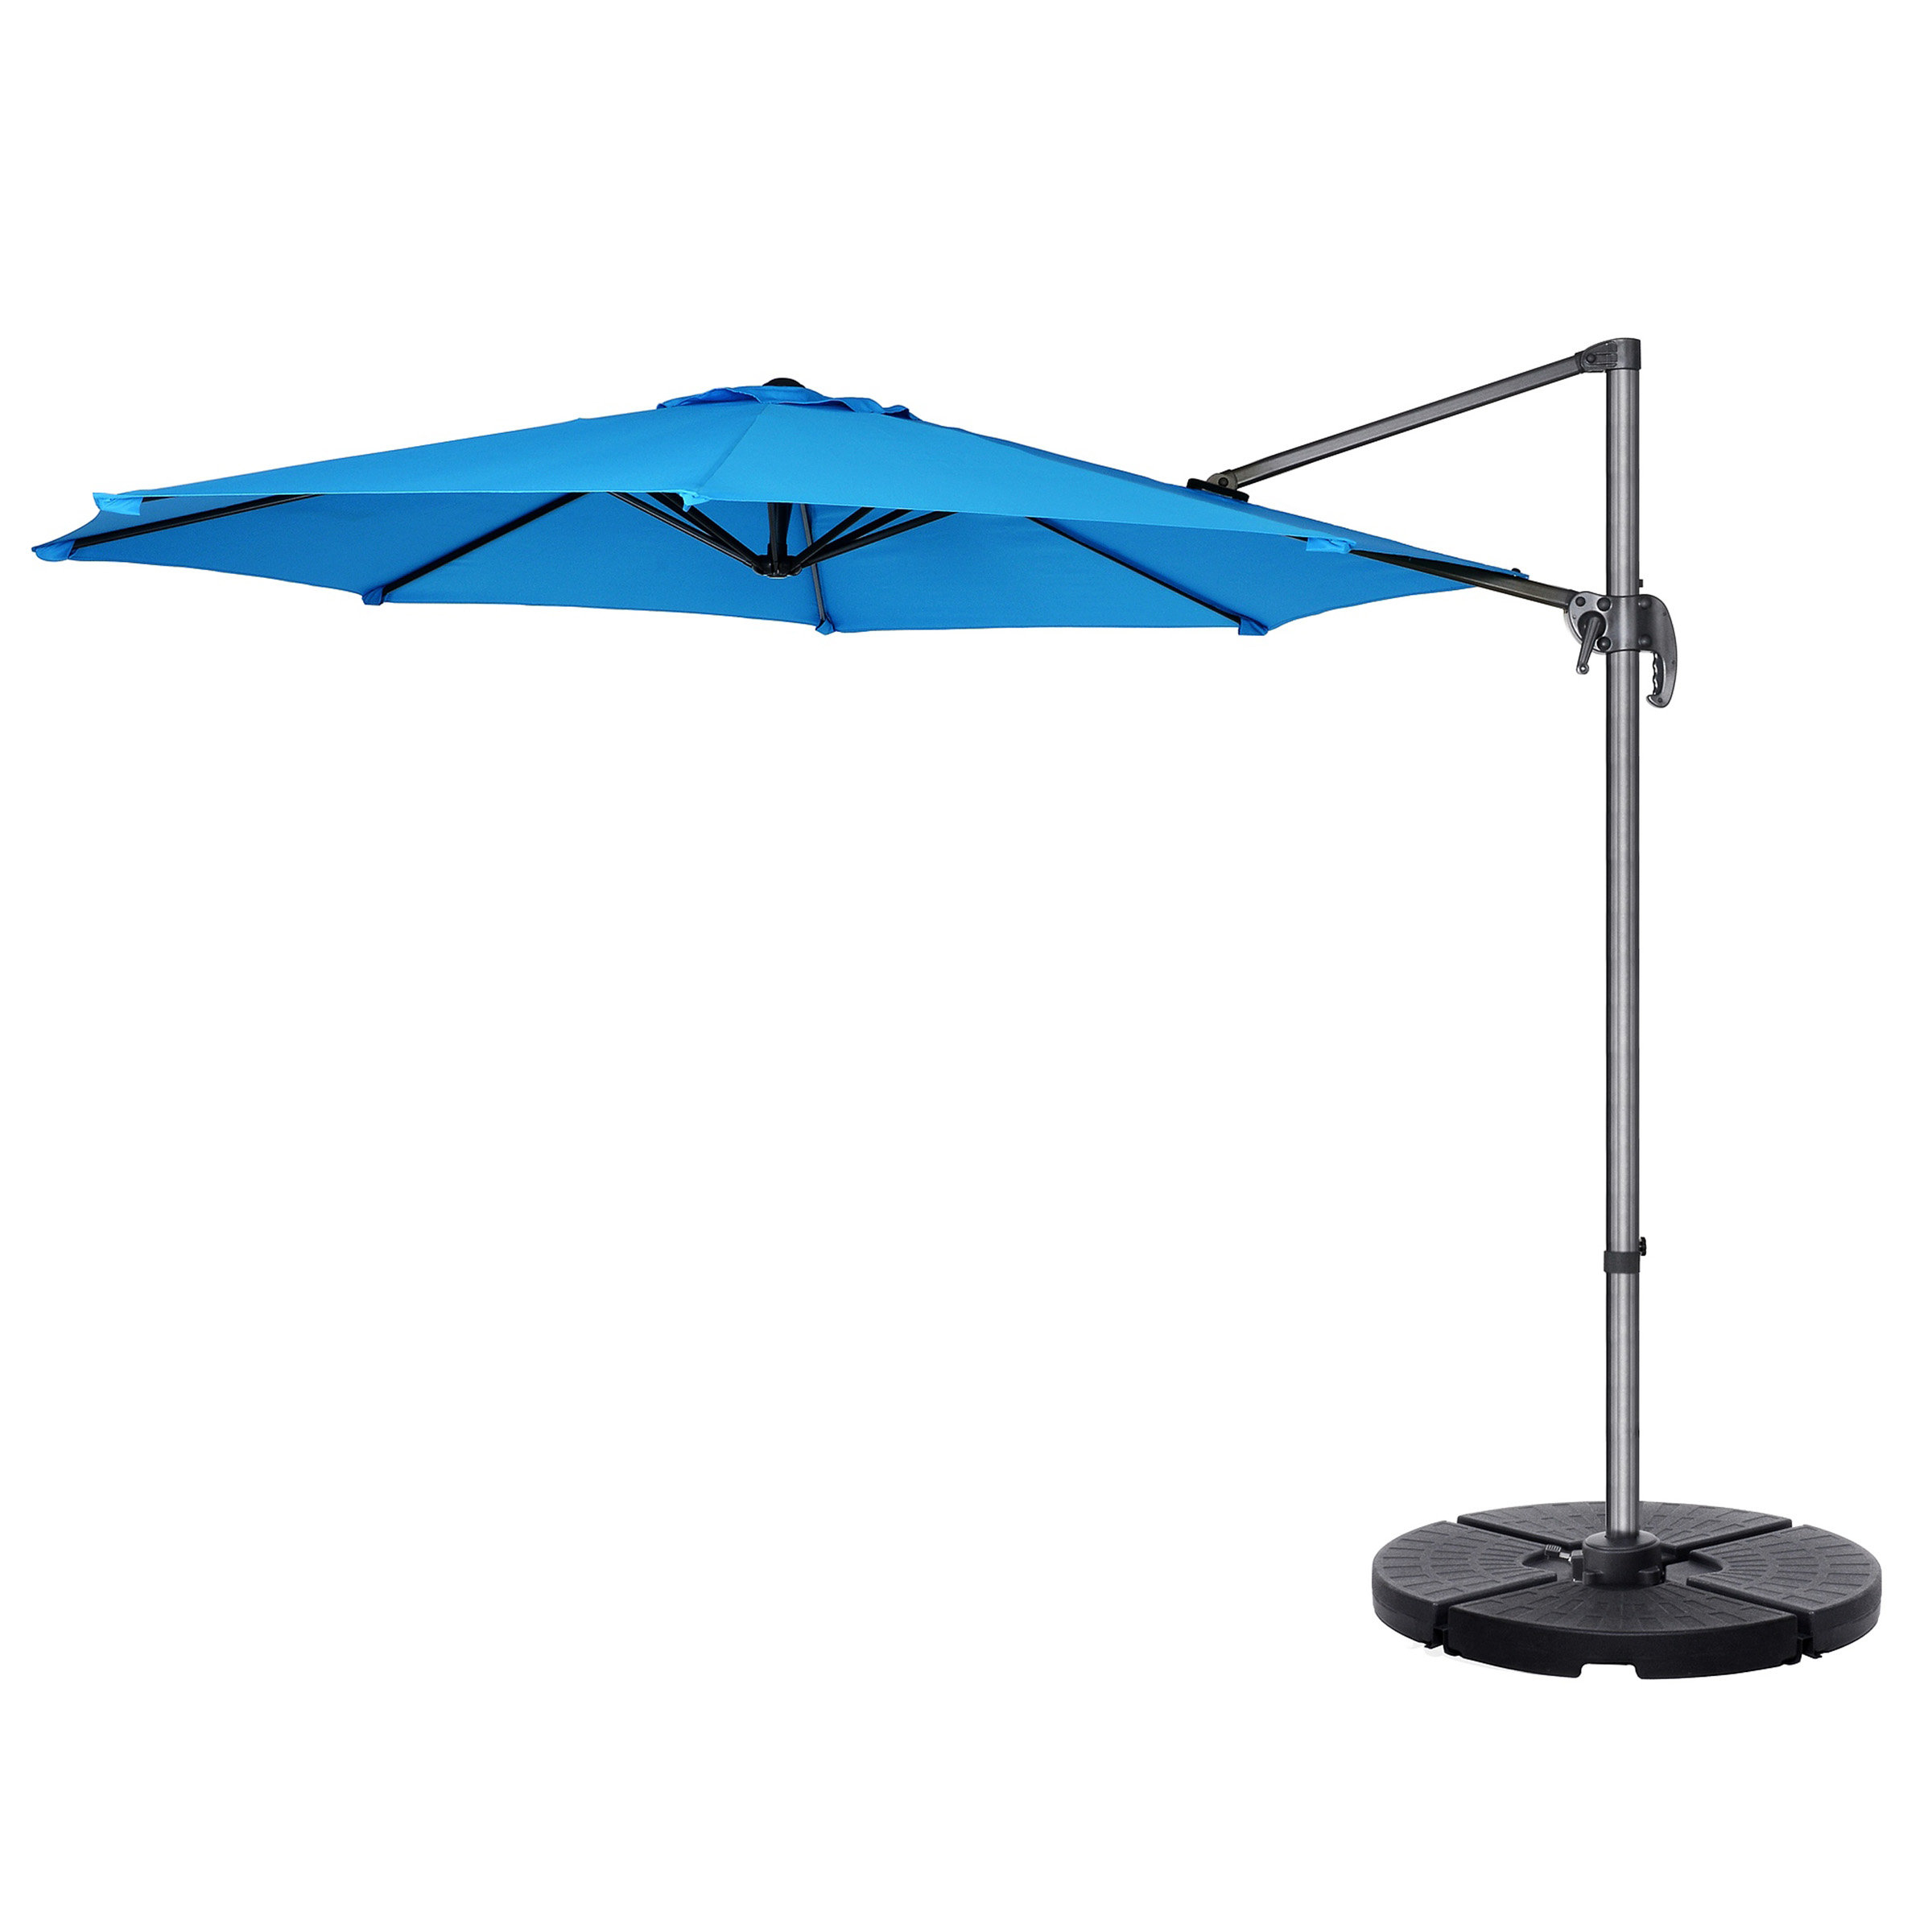 Current Cockermouth Rotating 10' Cantilever Umbrella Intended For Alyssa Freeport Park Market Umbrellas (View 6 of 20)